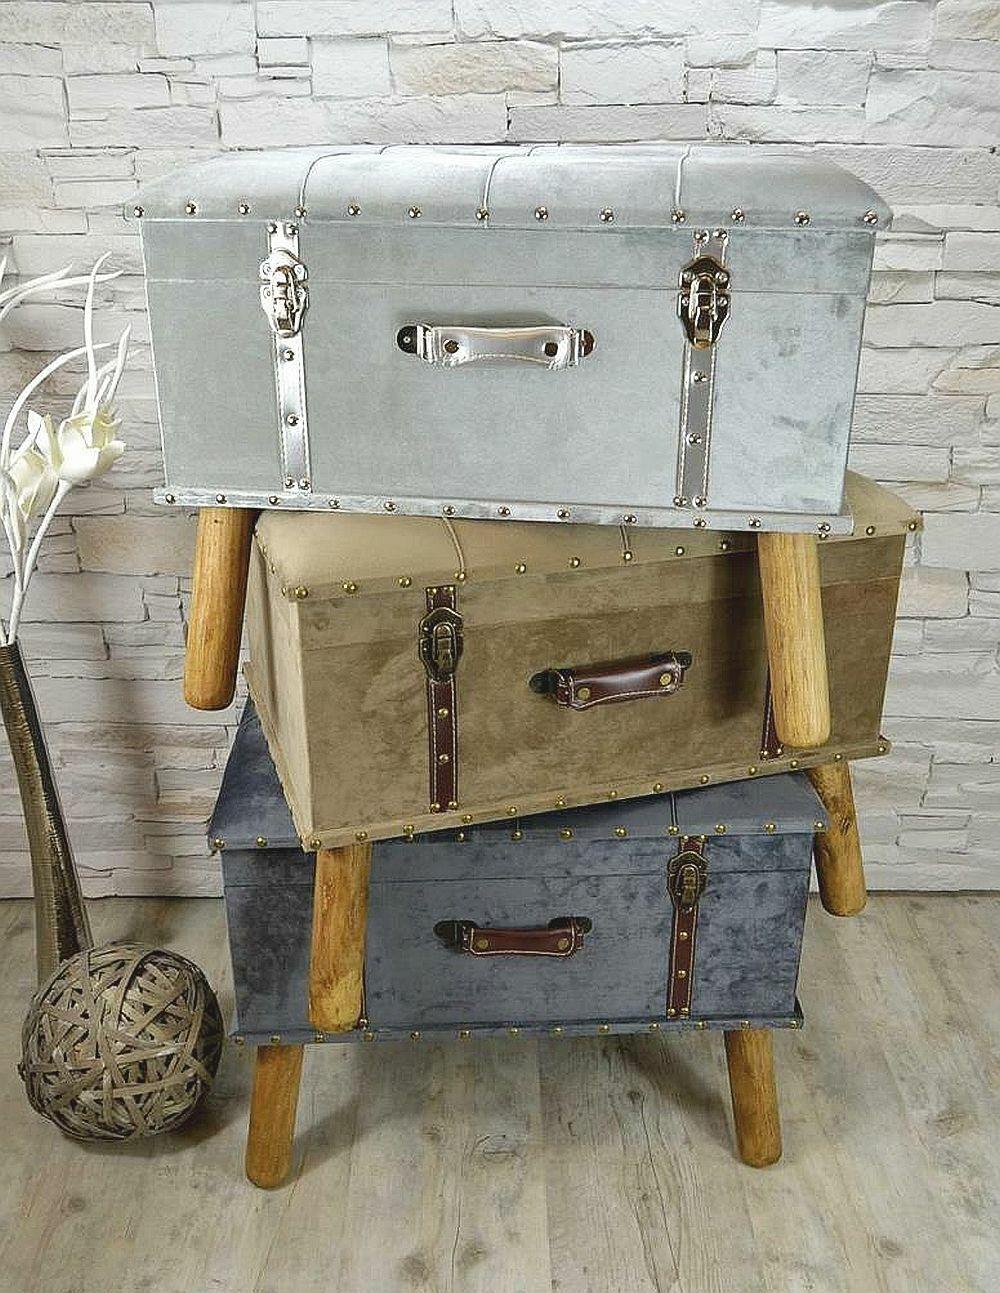 Hocker Polsterhocker Suitcase Pouf Truhe Staufach Truhenbank Sitzbank Ottomane